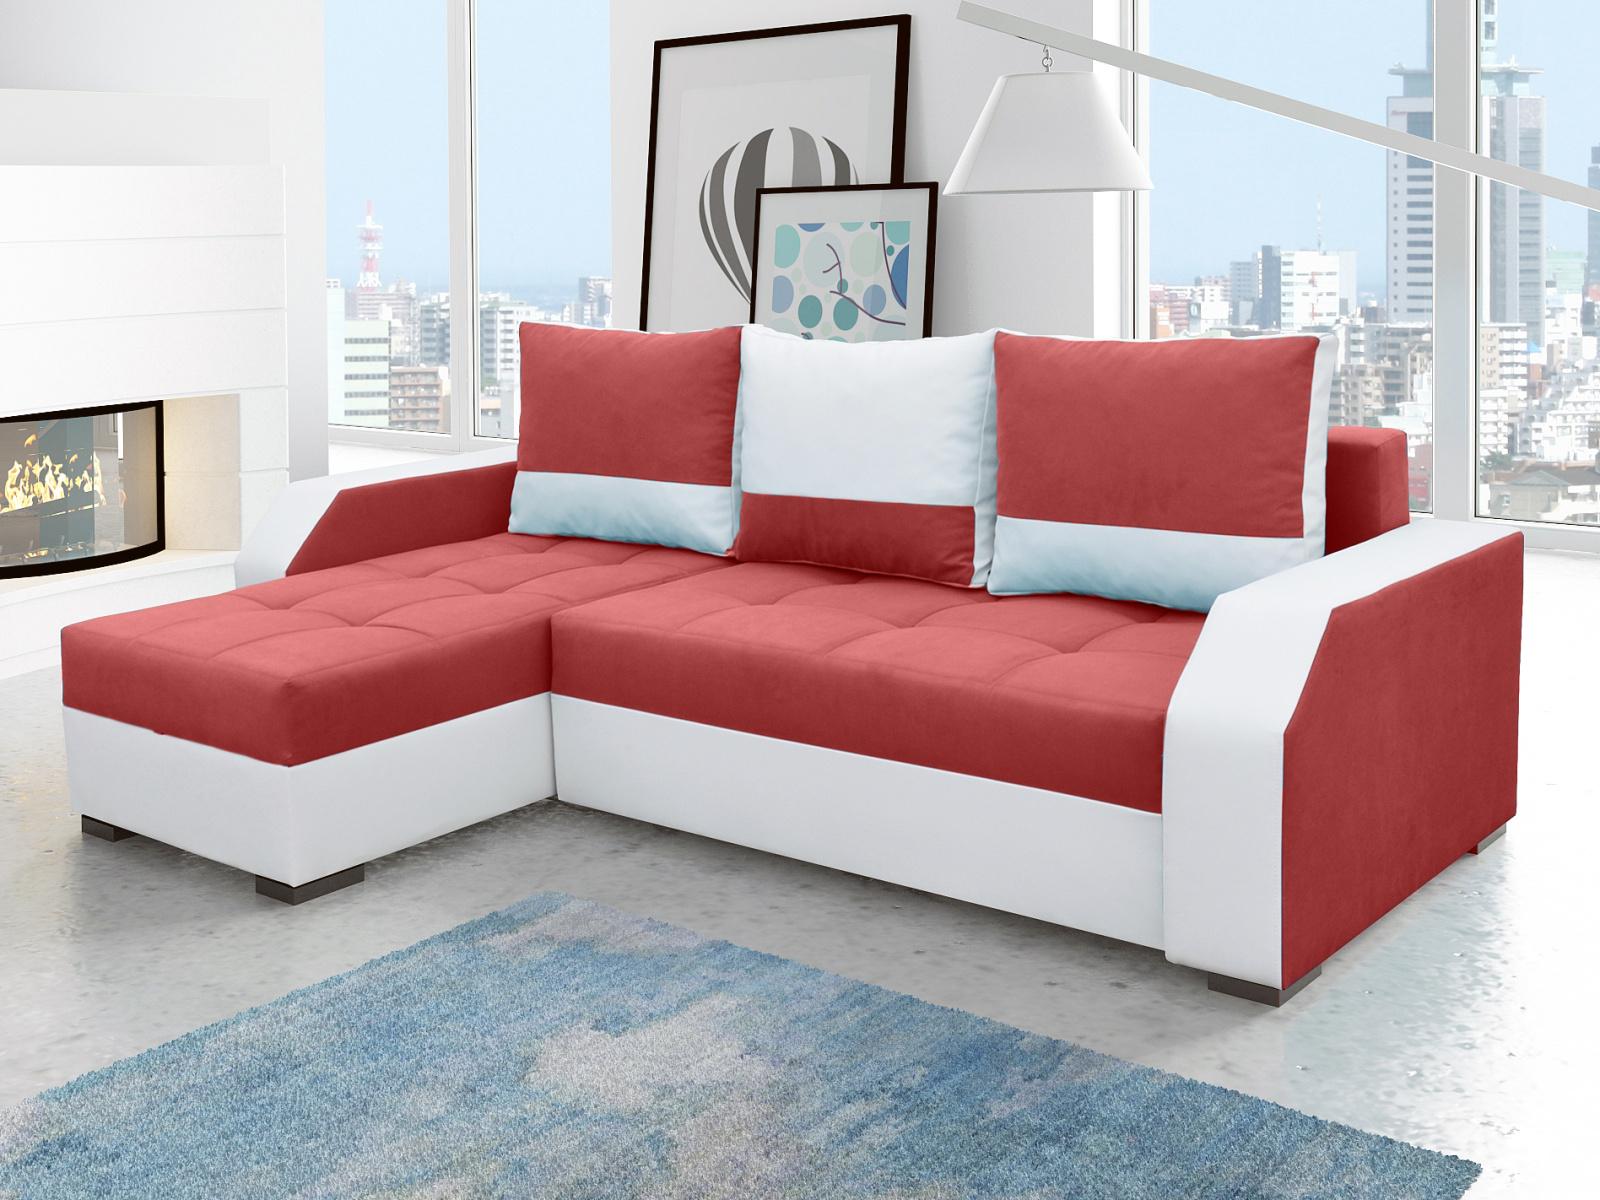 ELTAP Rohová sedačka ARIS 02, červená látka/bílá ekokůže